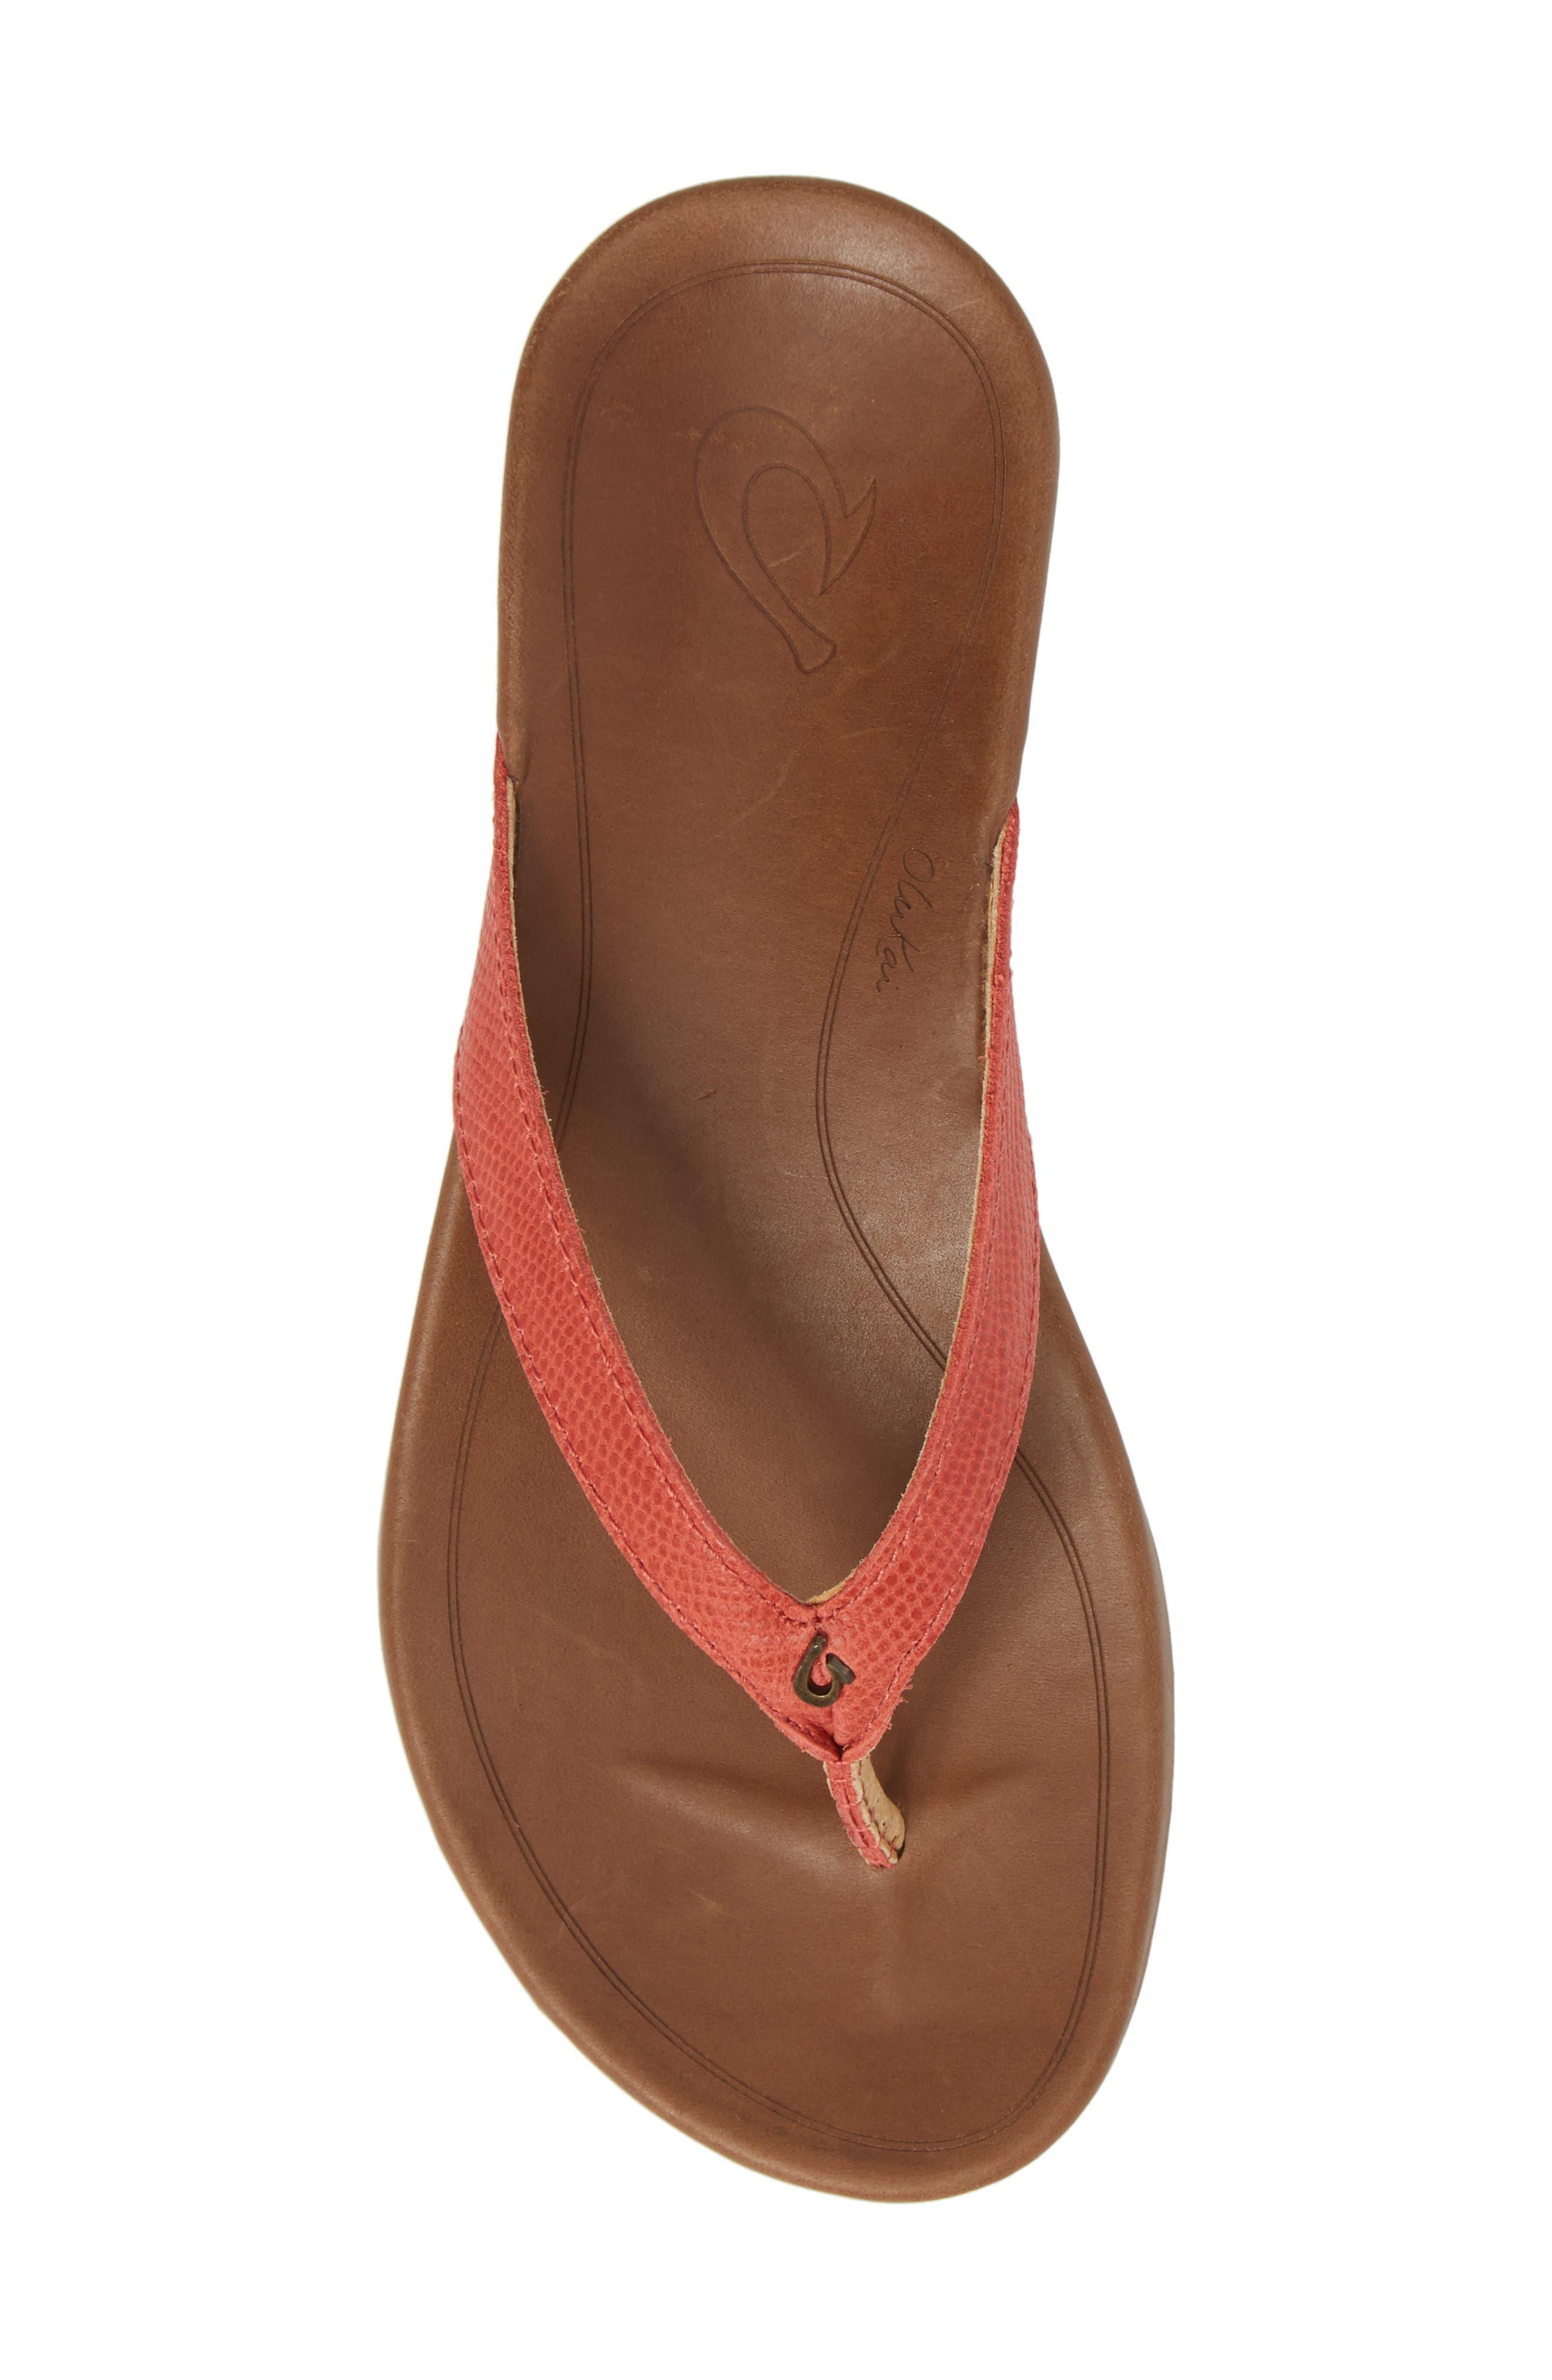 'Hi Ona' Flip Flop,                             Alternate thumbnail 5, color,                             Paprika/ Tan Leather